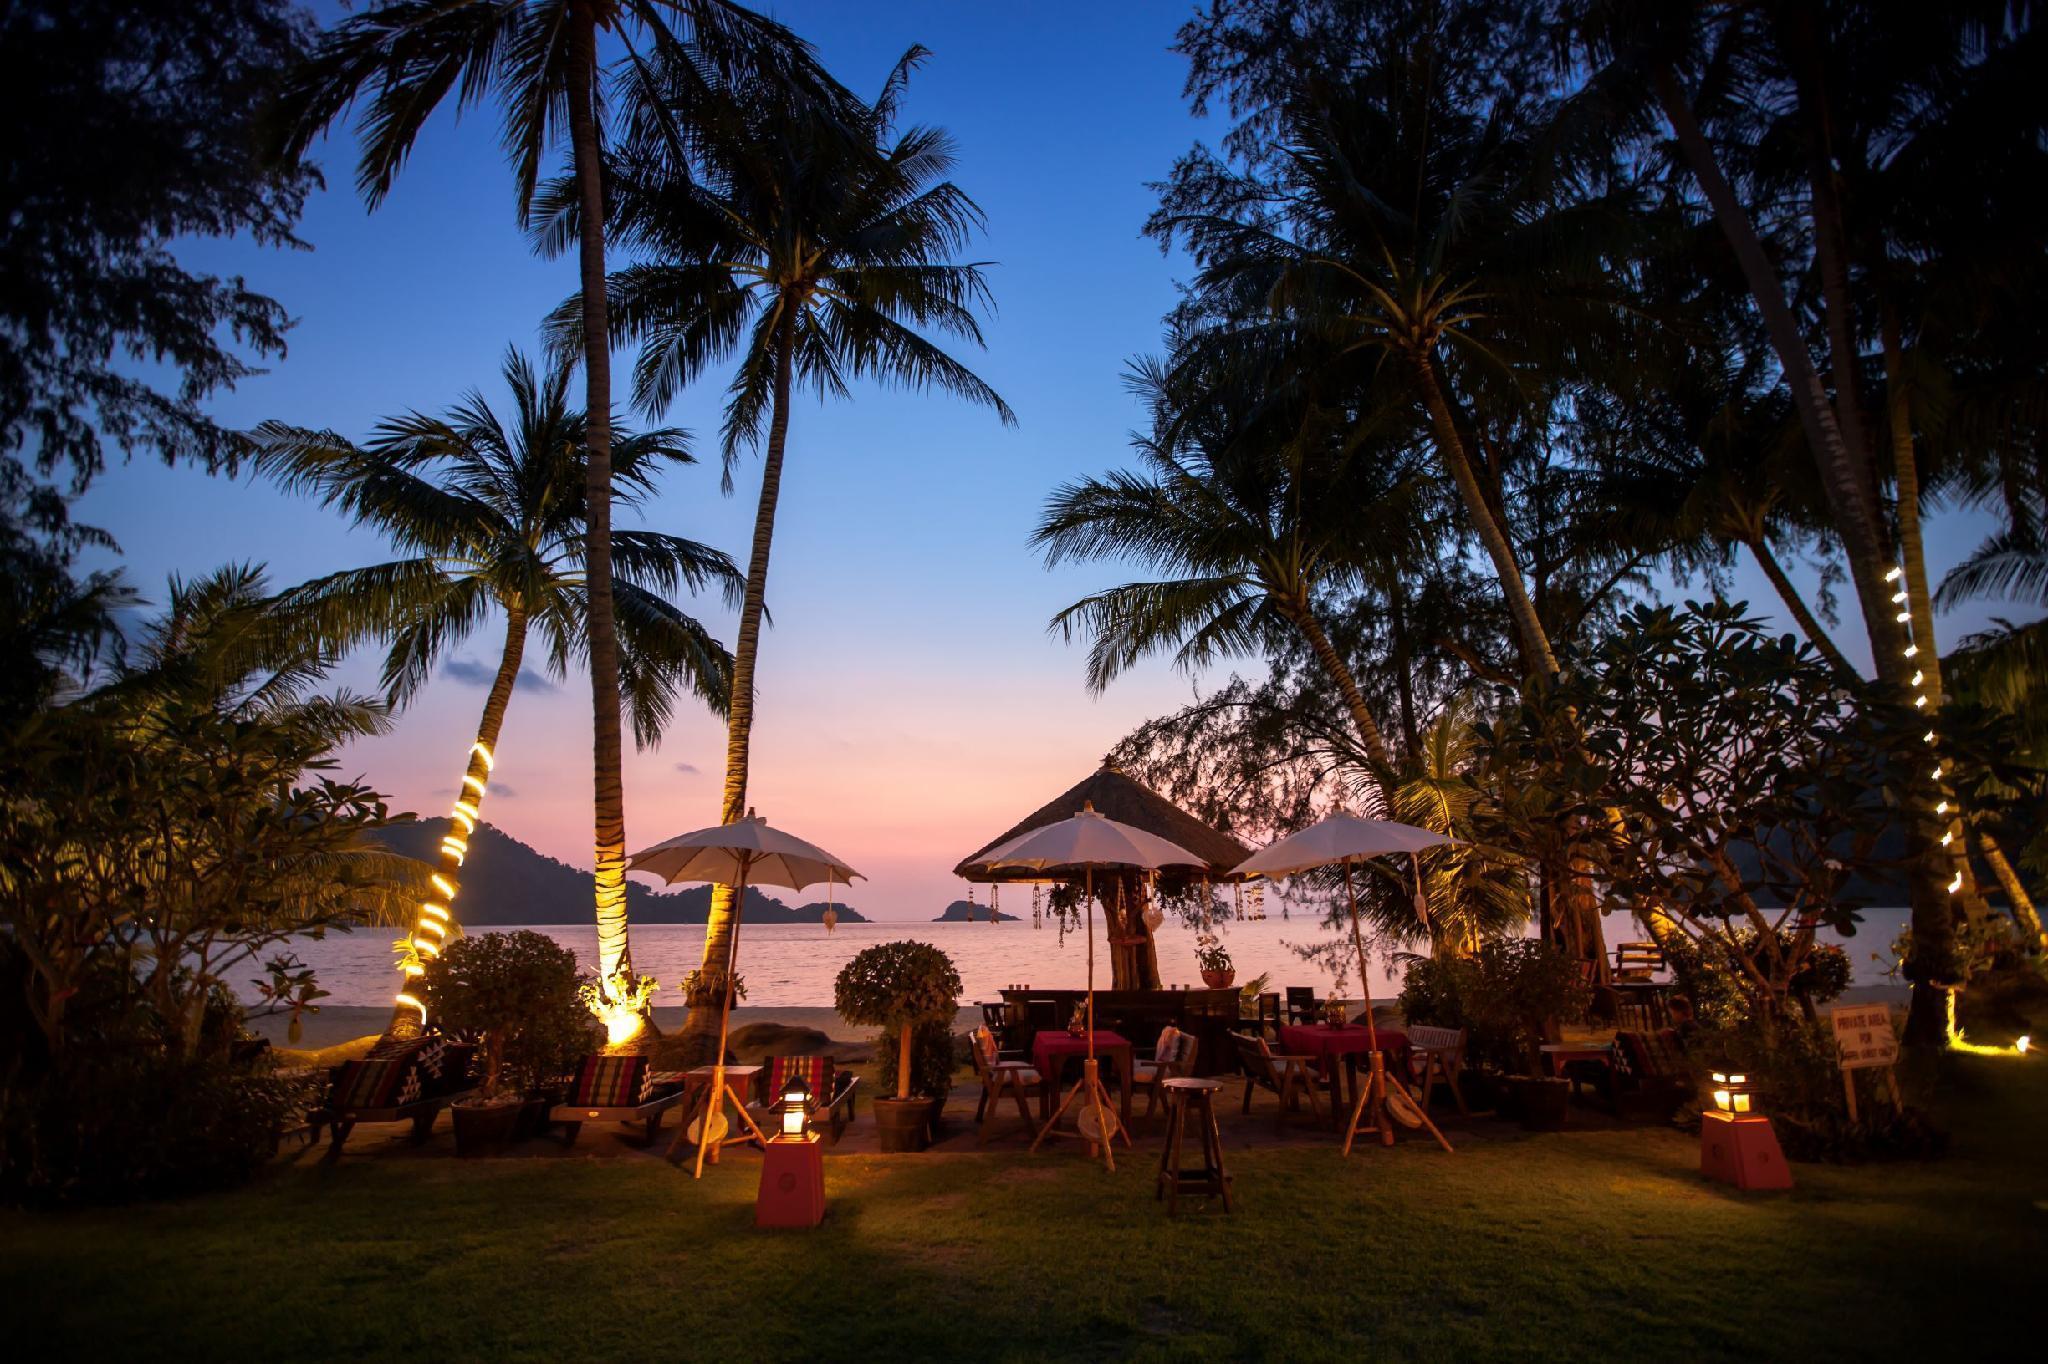 Little Sunshine Boutique Beach Resort & Spa ลิตเติ้ล ซันไชน์ บูติก บีช รีสอร์ท แอนด์ สปา